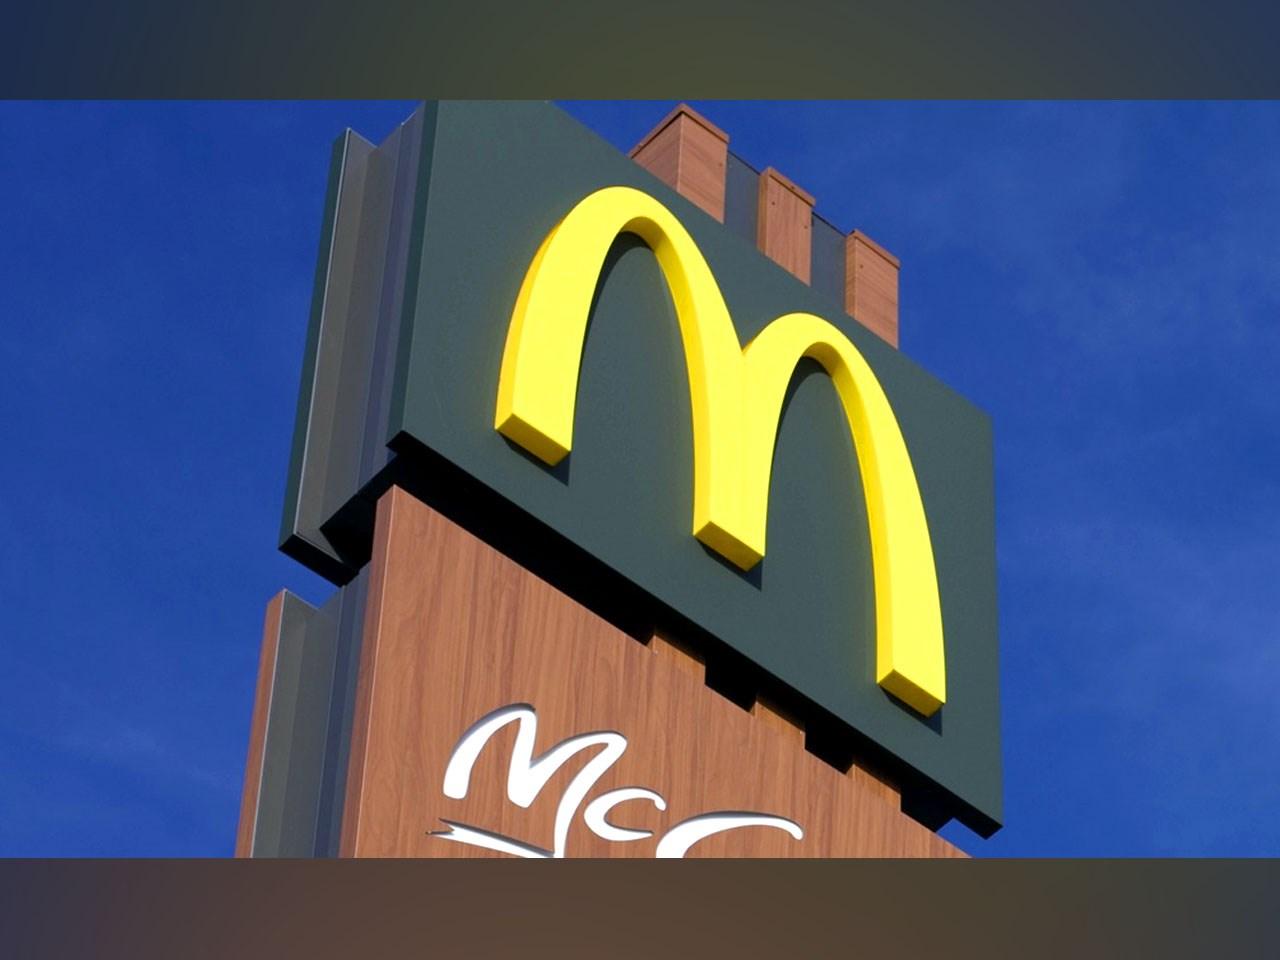 McDonald's_1527003851788.jpg